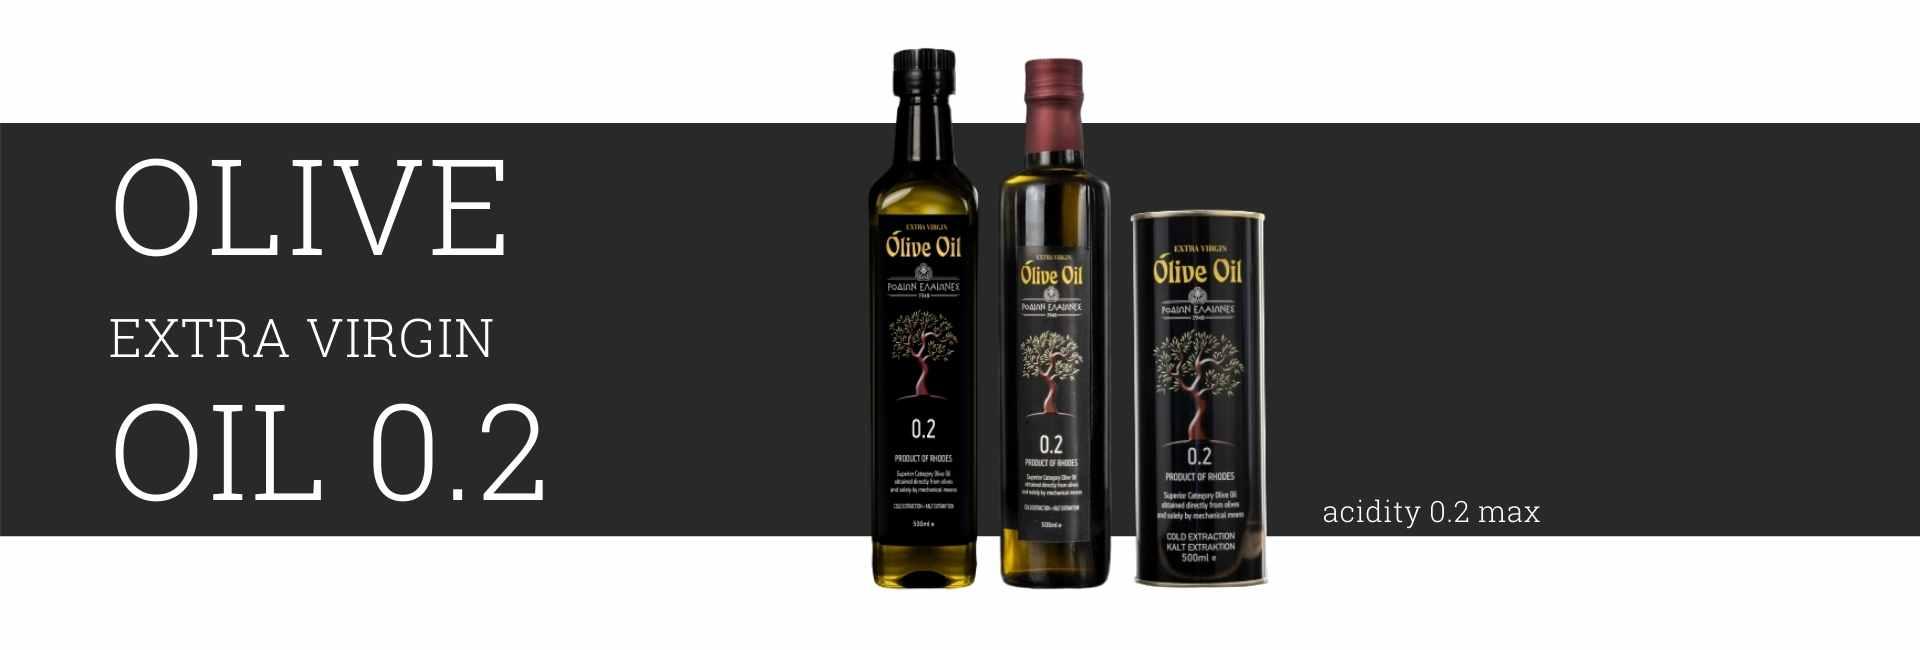 Buy Greek Superior Category Extra Virgin Olive Oil